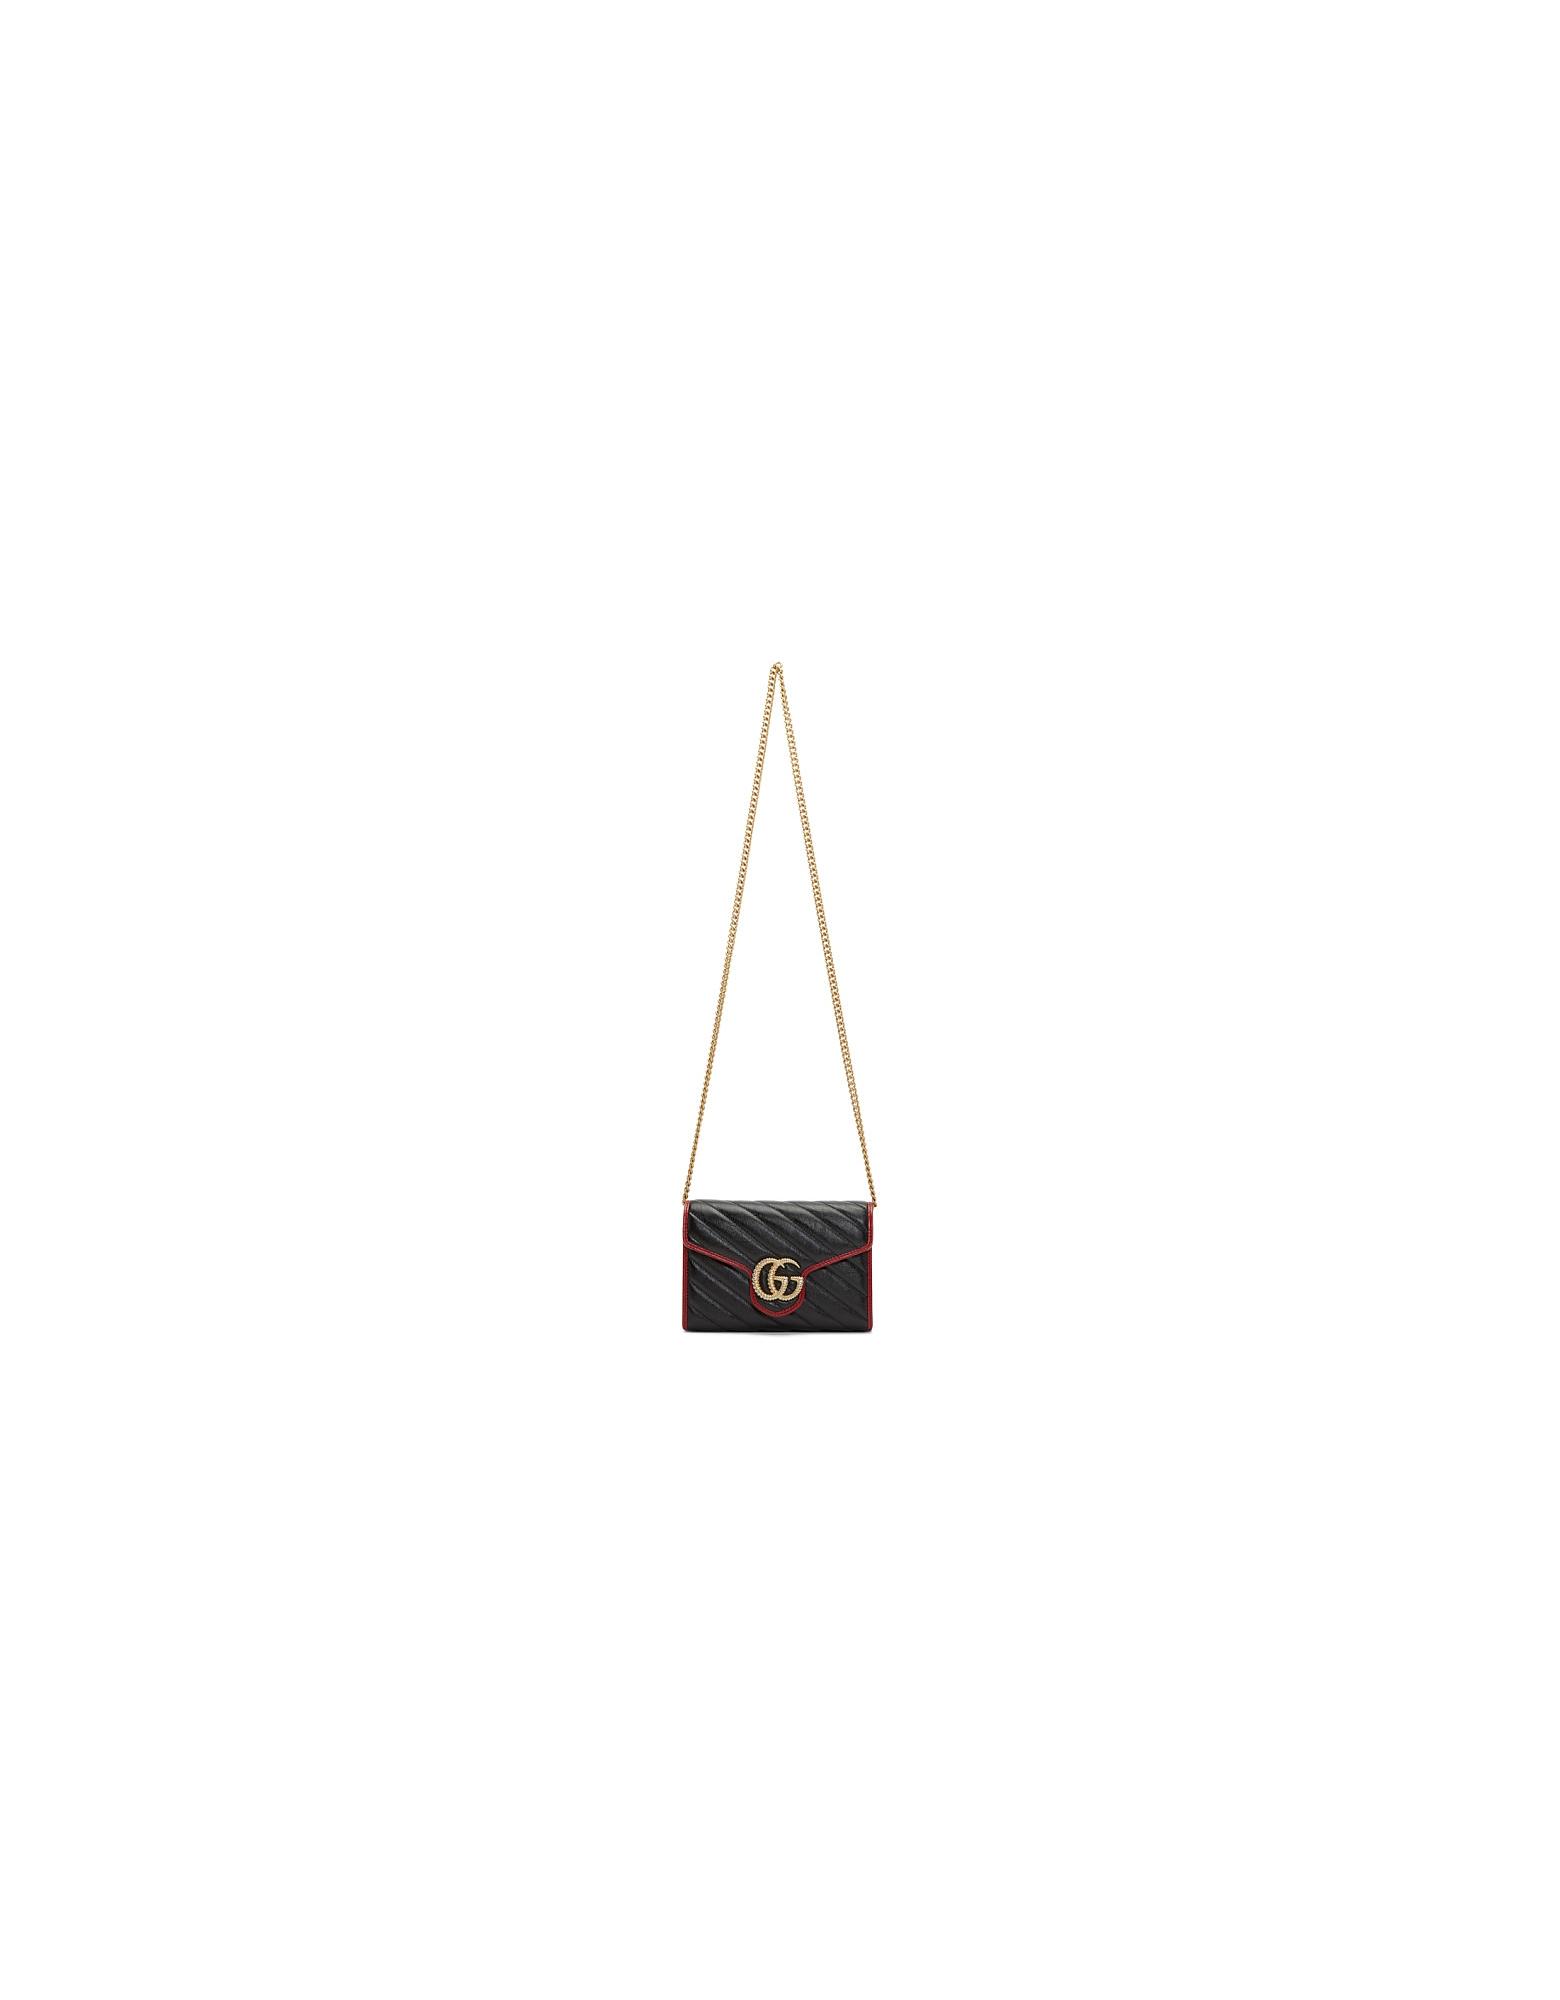 Gucci Designer Handbags, Black and Red Torchon GG Marmont Shoulder Bag